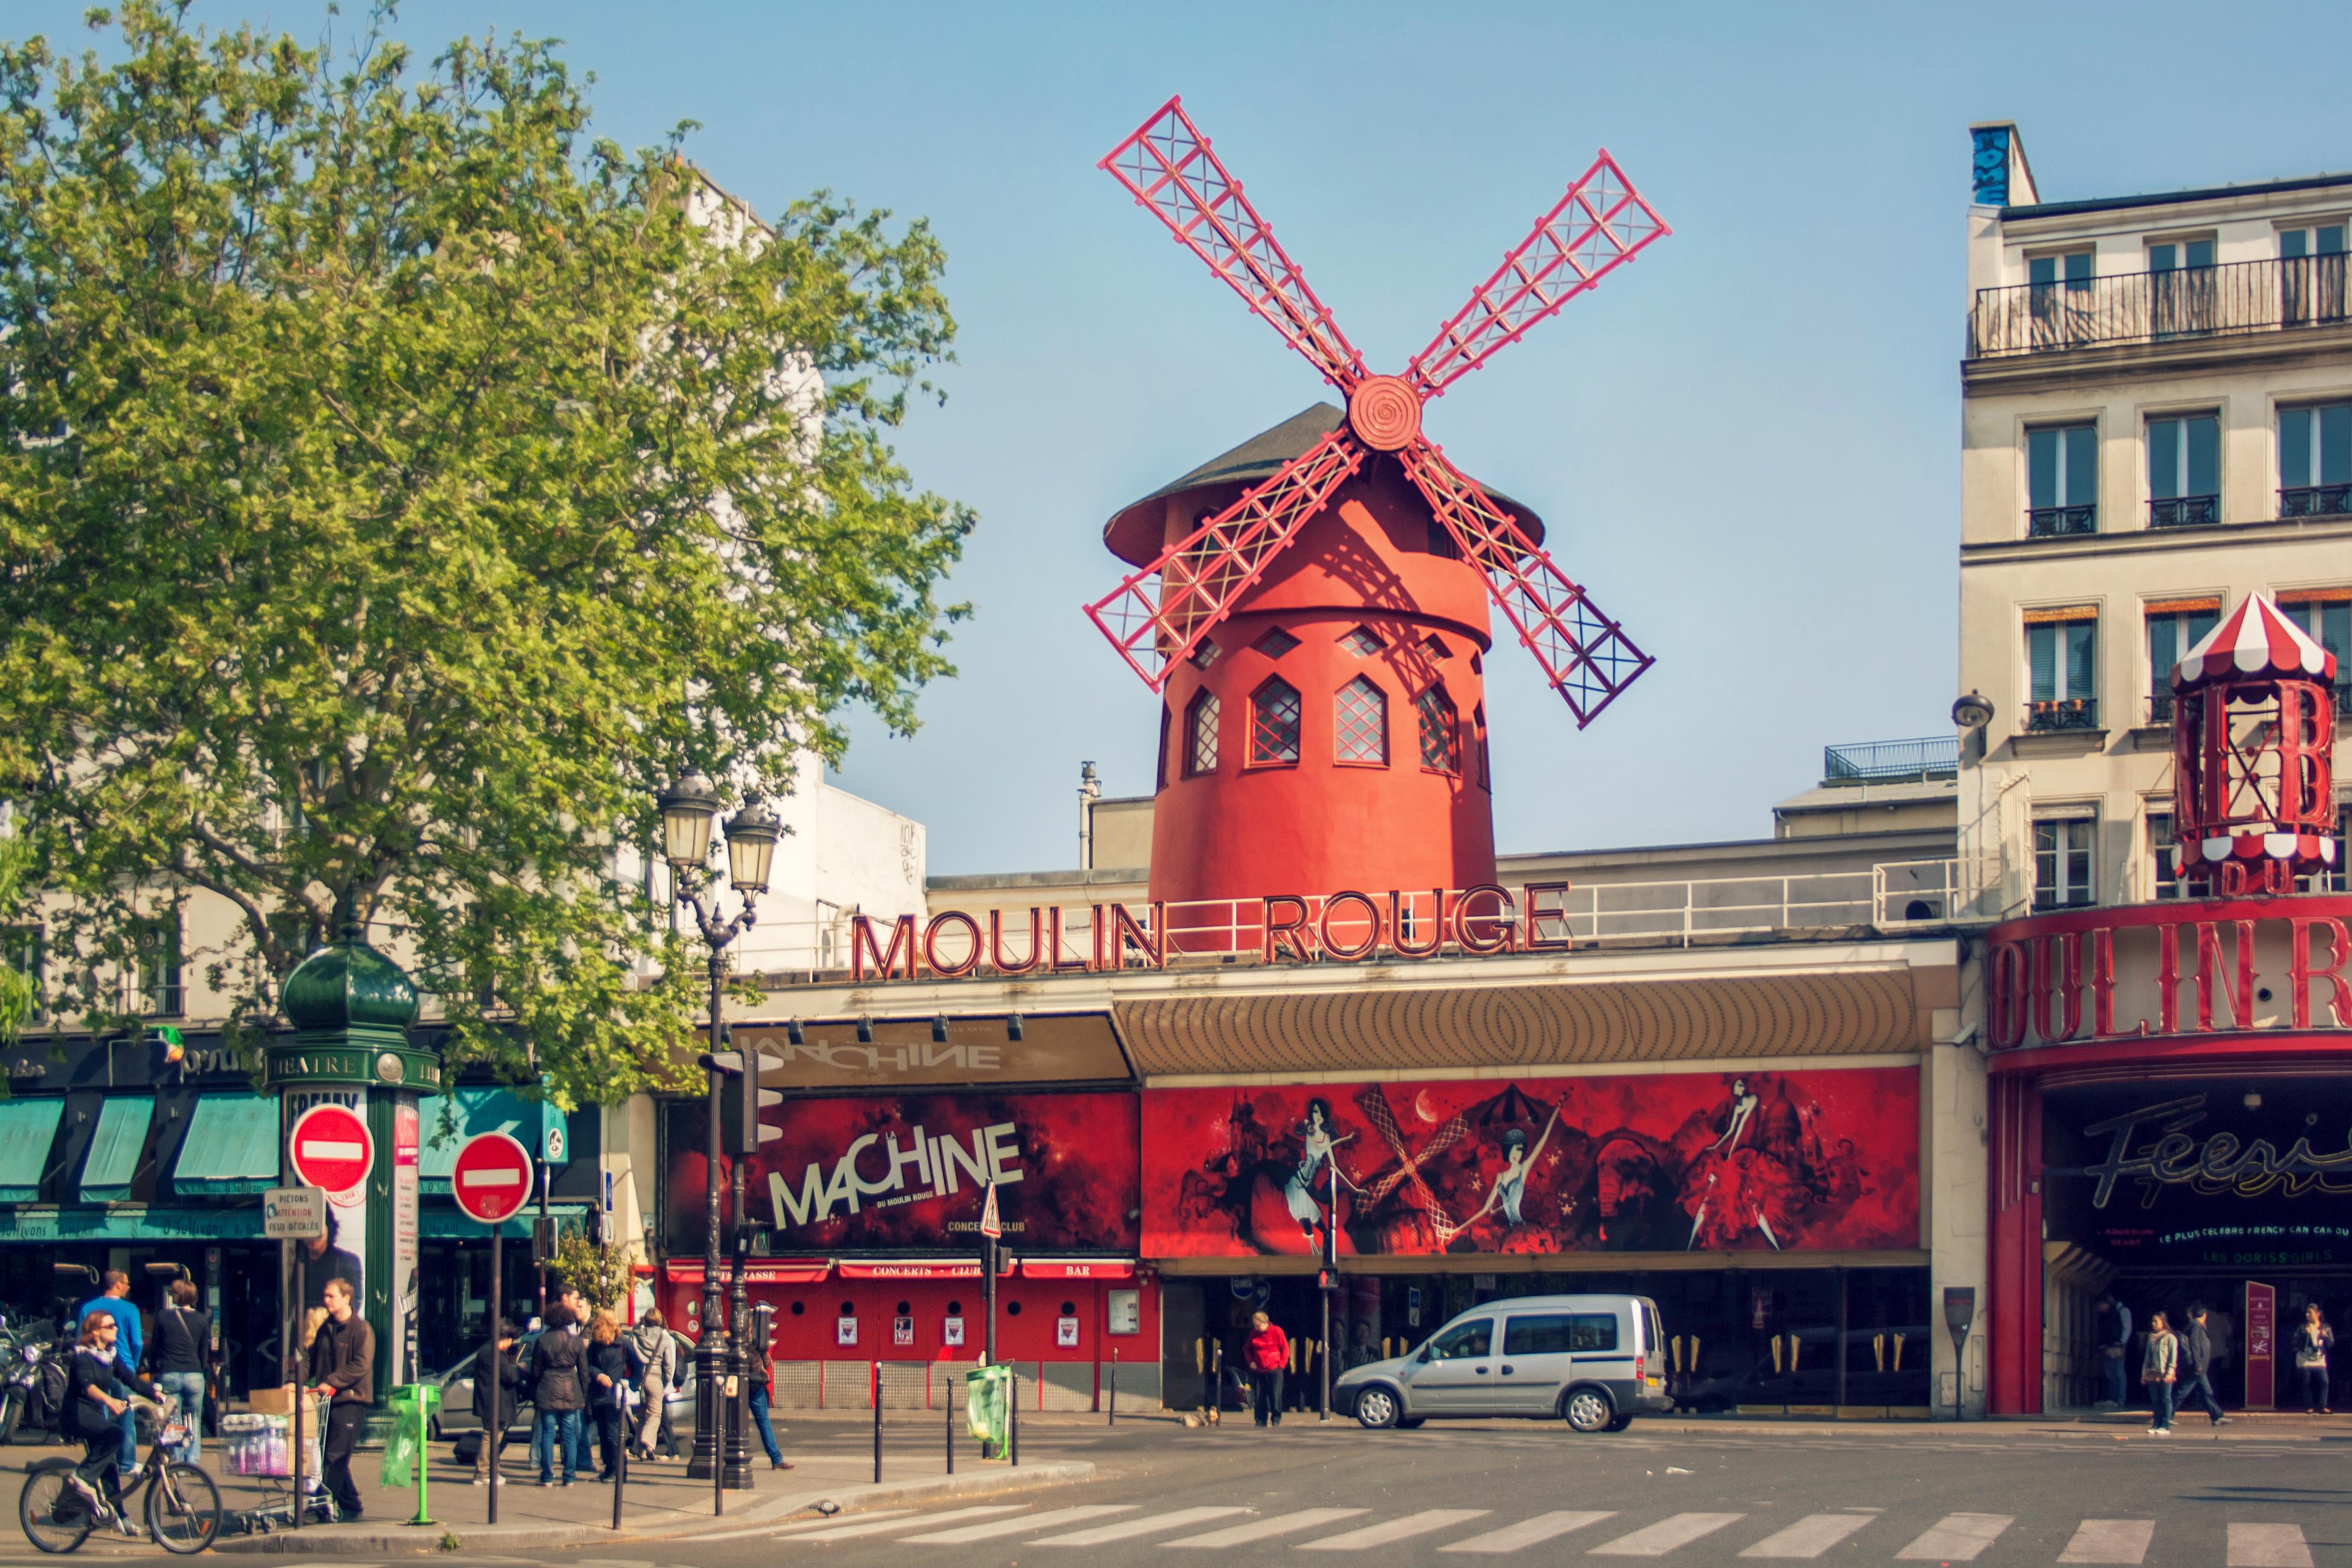 Ladawan:Moulin Rouge, 17 April 2011.jpg - Wikipedia